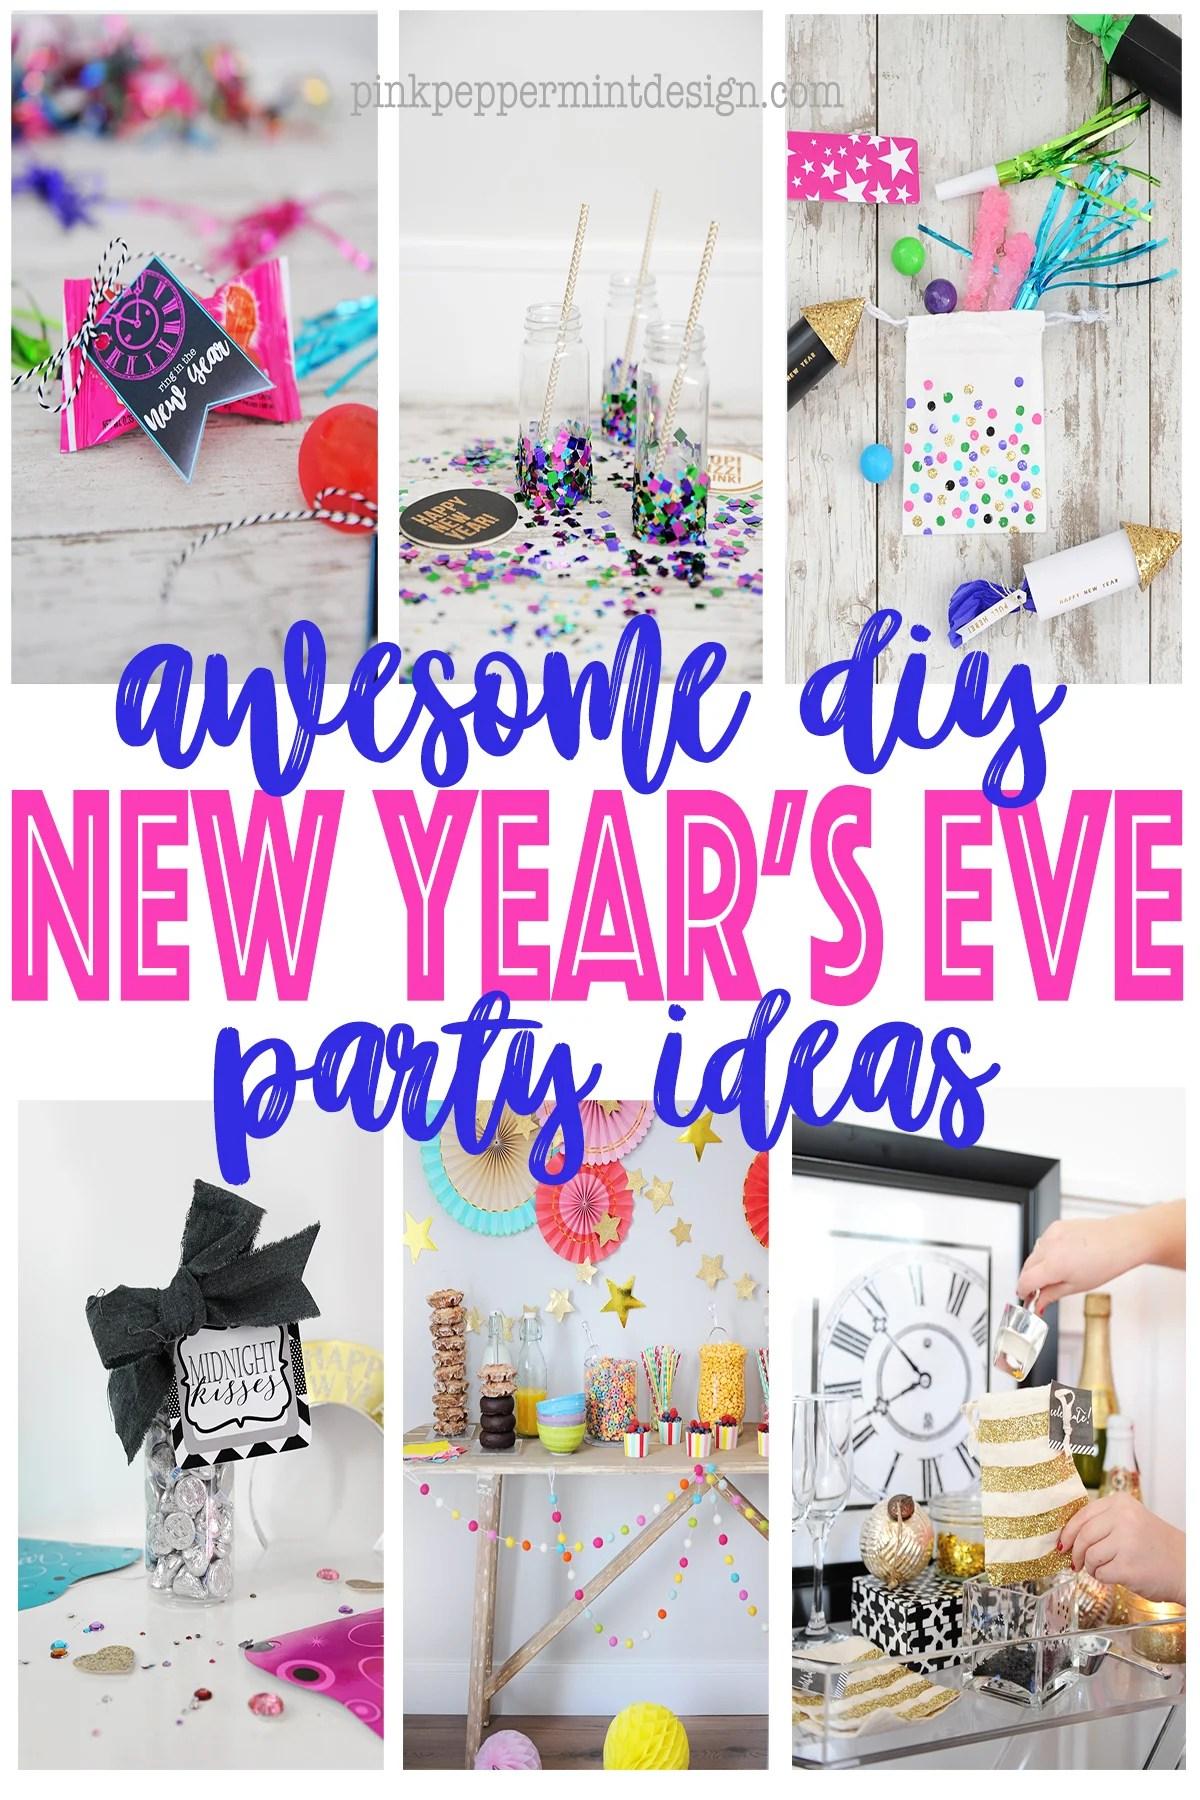 10 Fun DIY New Year's Eve Ideas